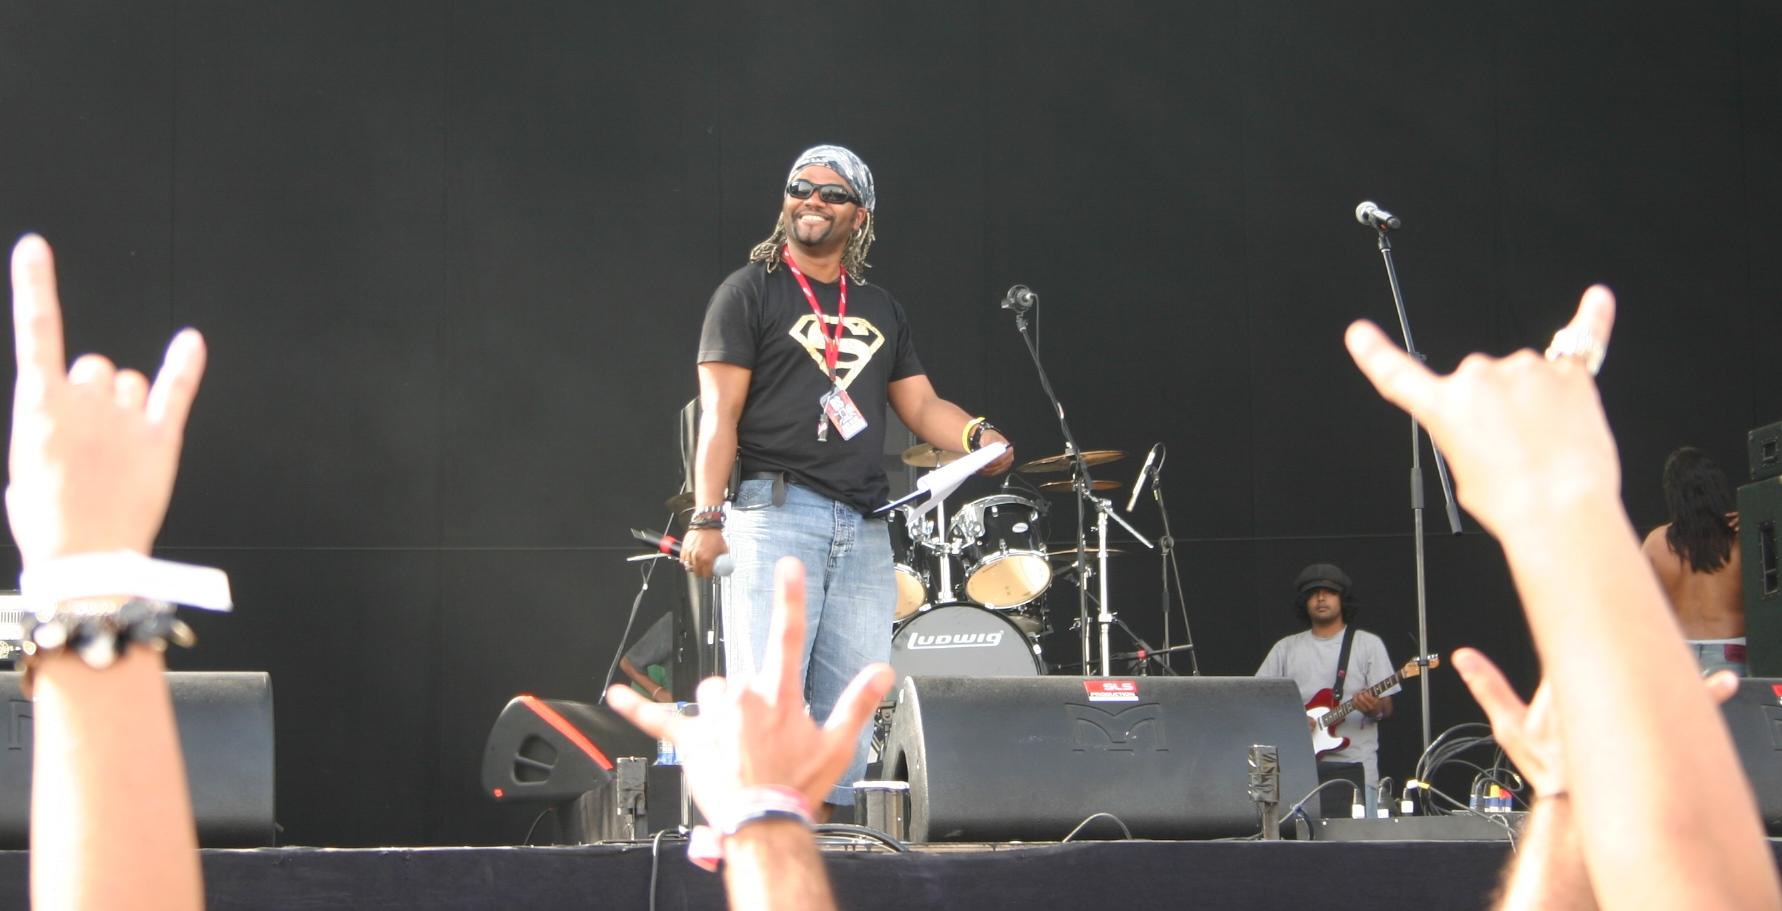 Working alongside Slash, The Prodigy and Muse at the Desert Rythmn Festival